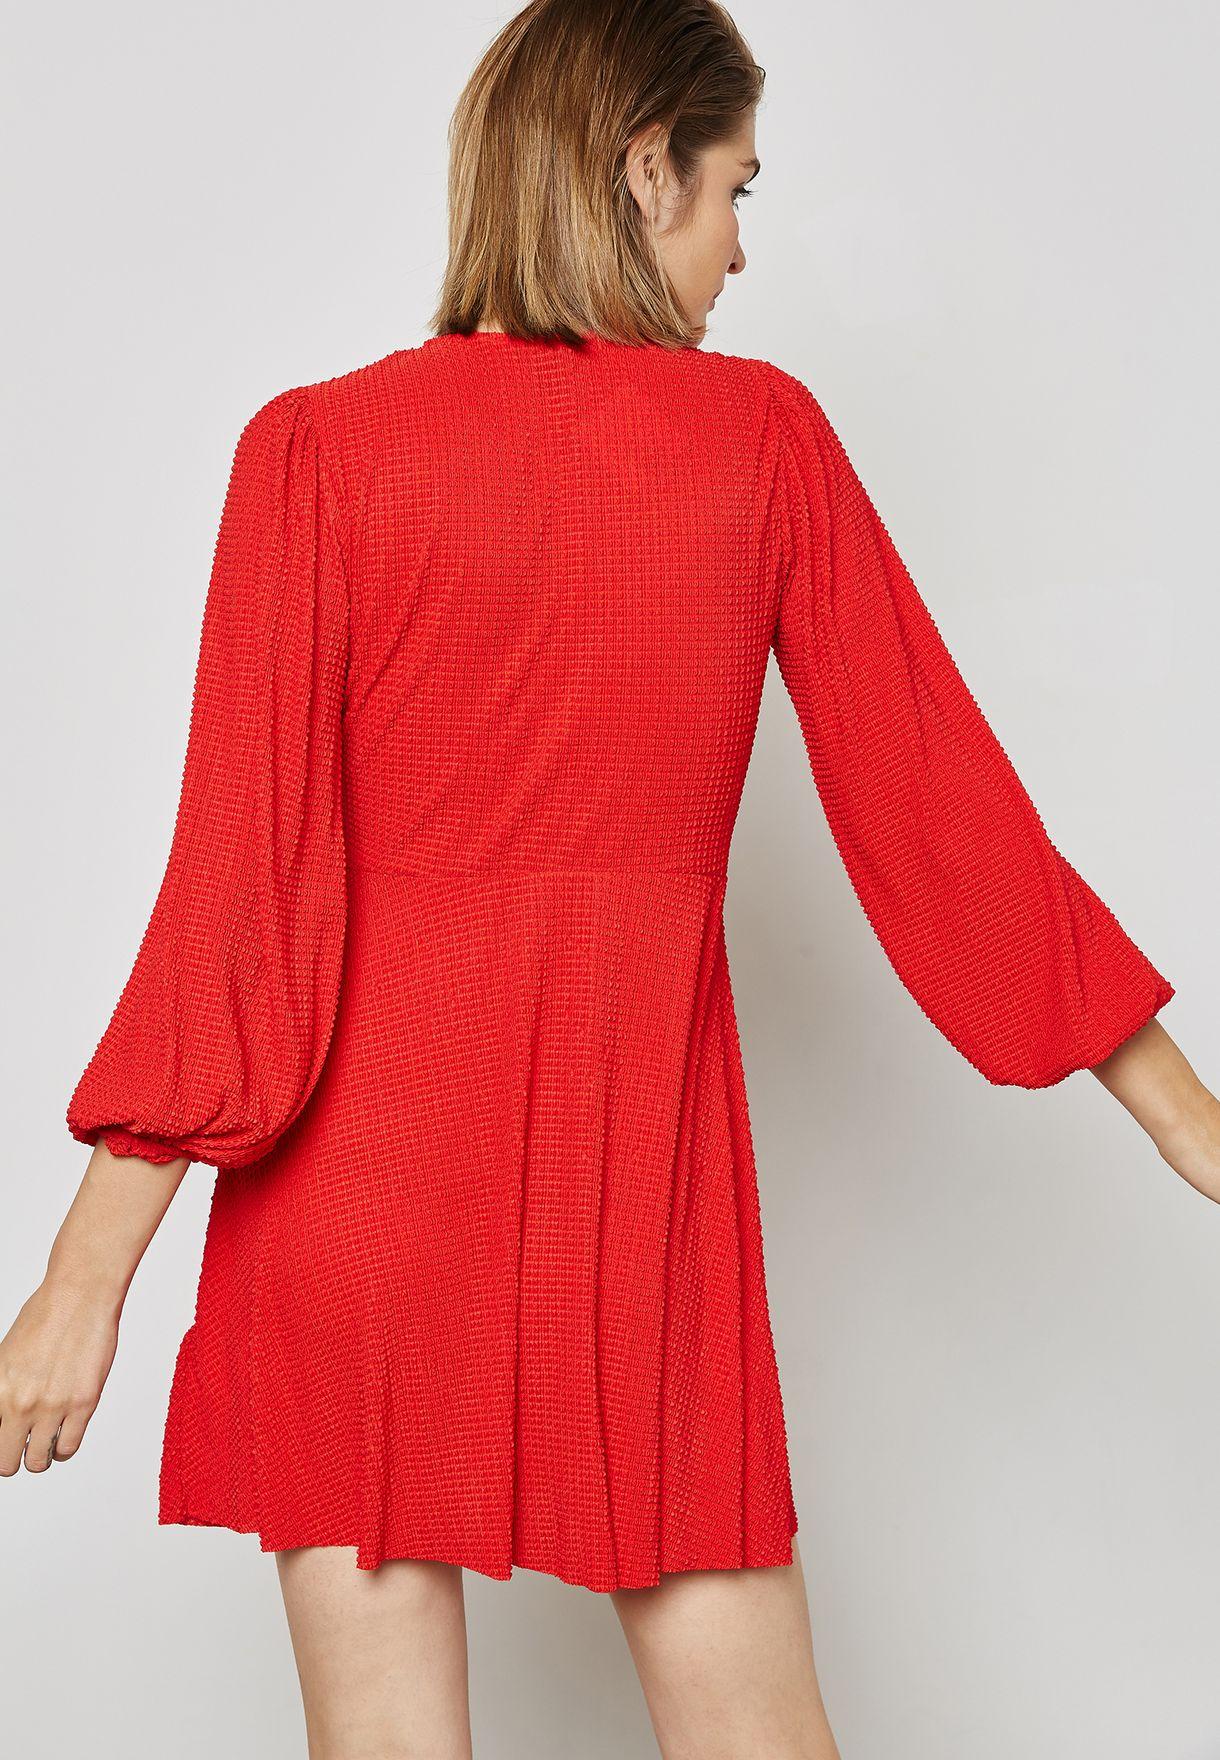 01226aa3997 Shop Topshop red Plisse Wrap Dress 35J06MRED for Women in Kuwait ...